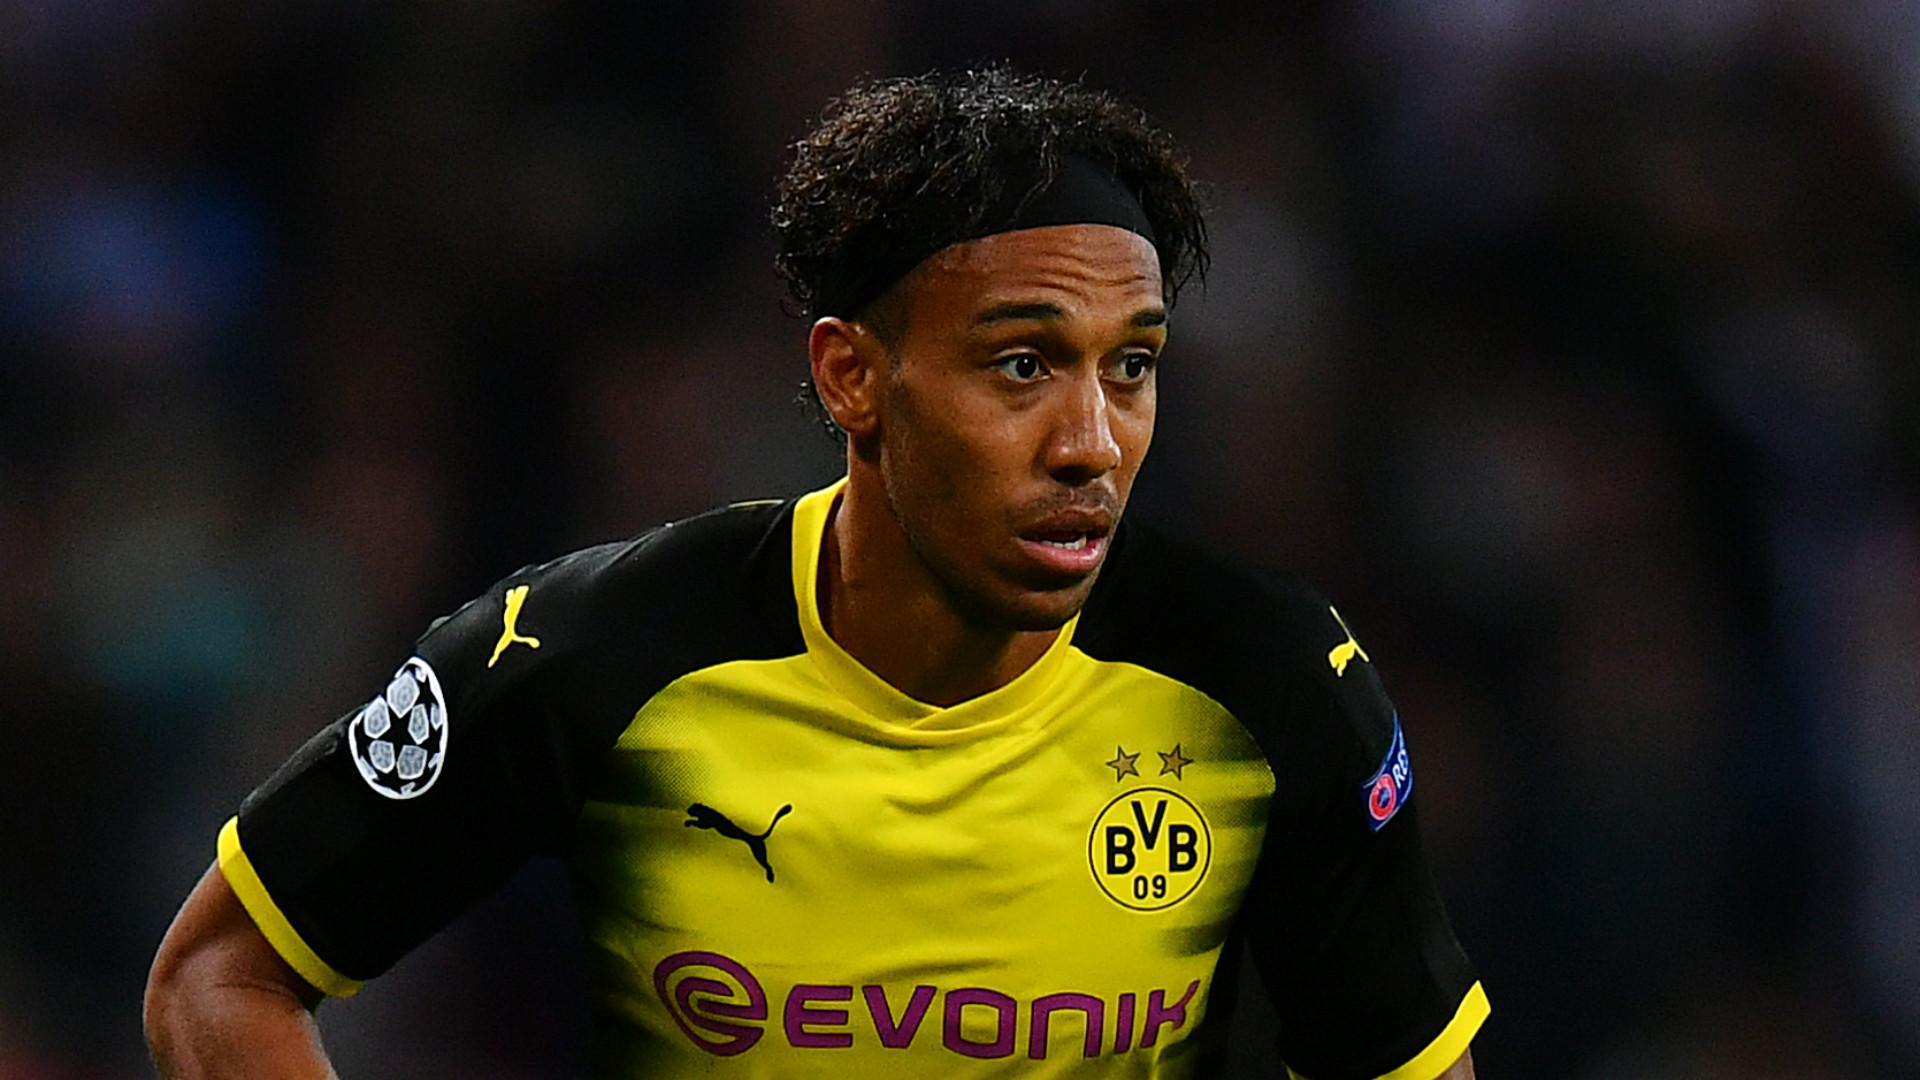 Bayern Munich's Lewandowski backs struggling Borussia Dortmund's Aubameyang